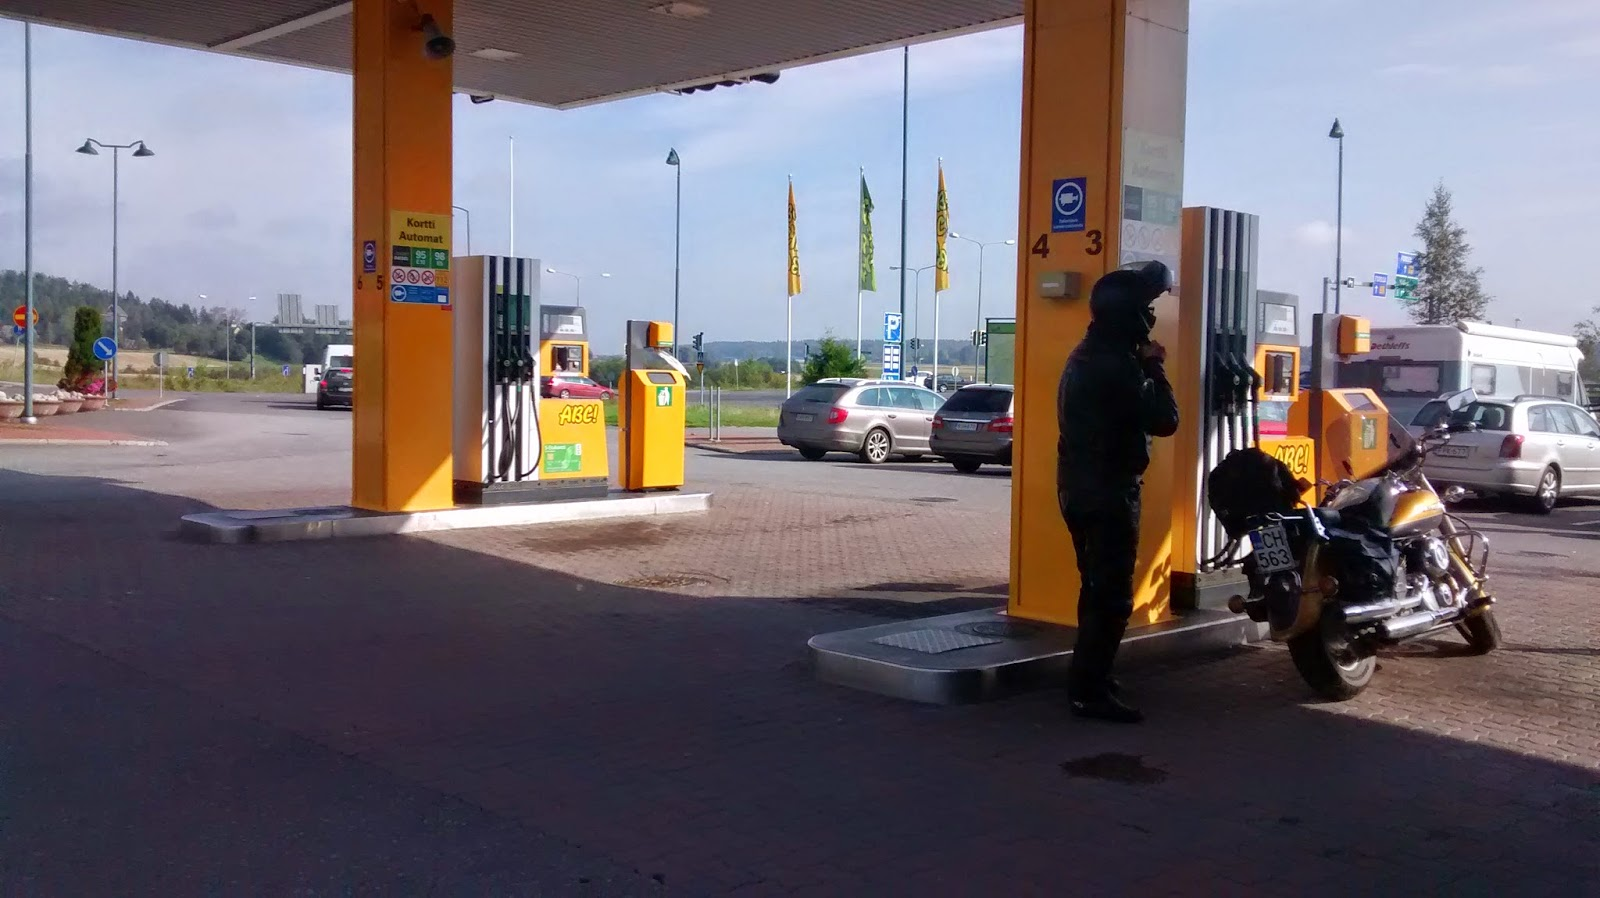 posto de gasolina na Finlândia